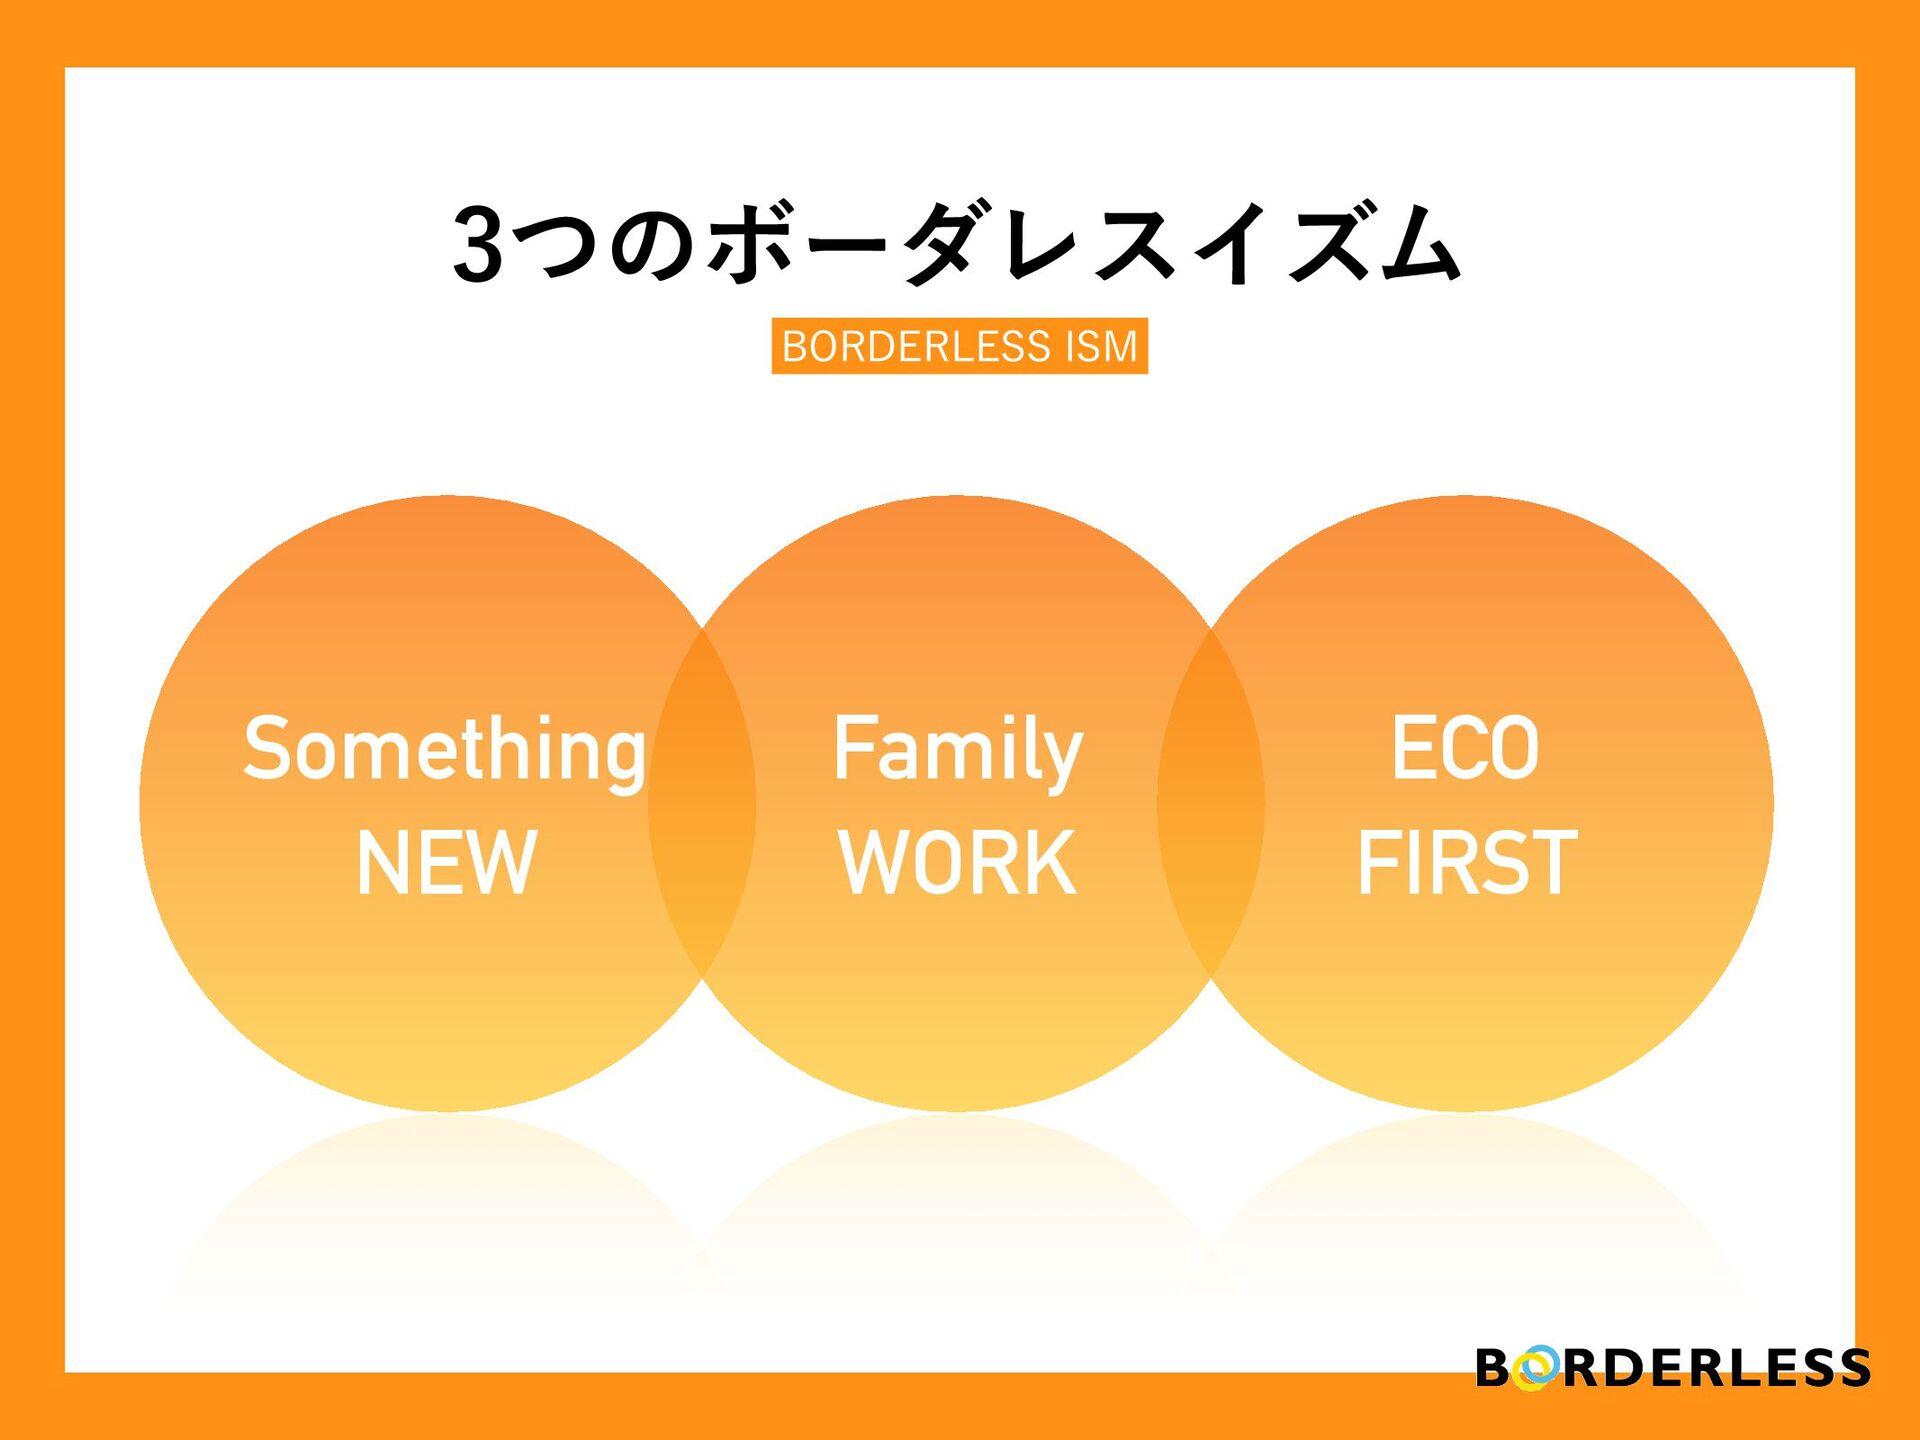 N Something NEW Family WORK ECO FIRST ͭͷϘʔμϨεΠ...